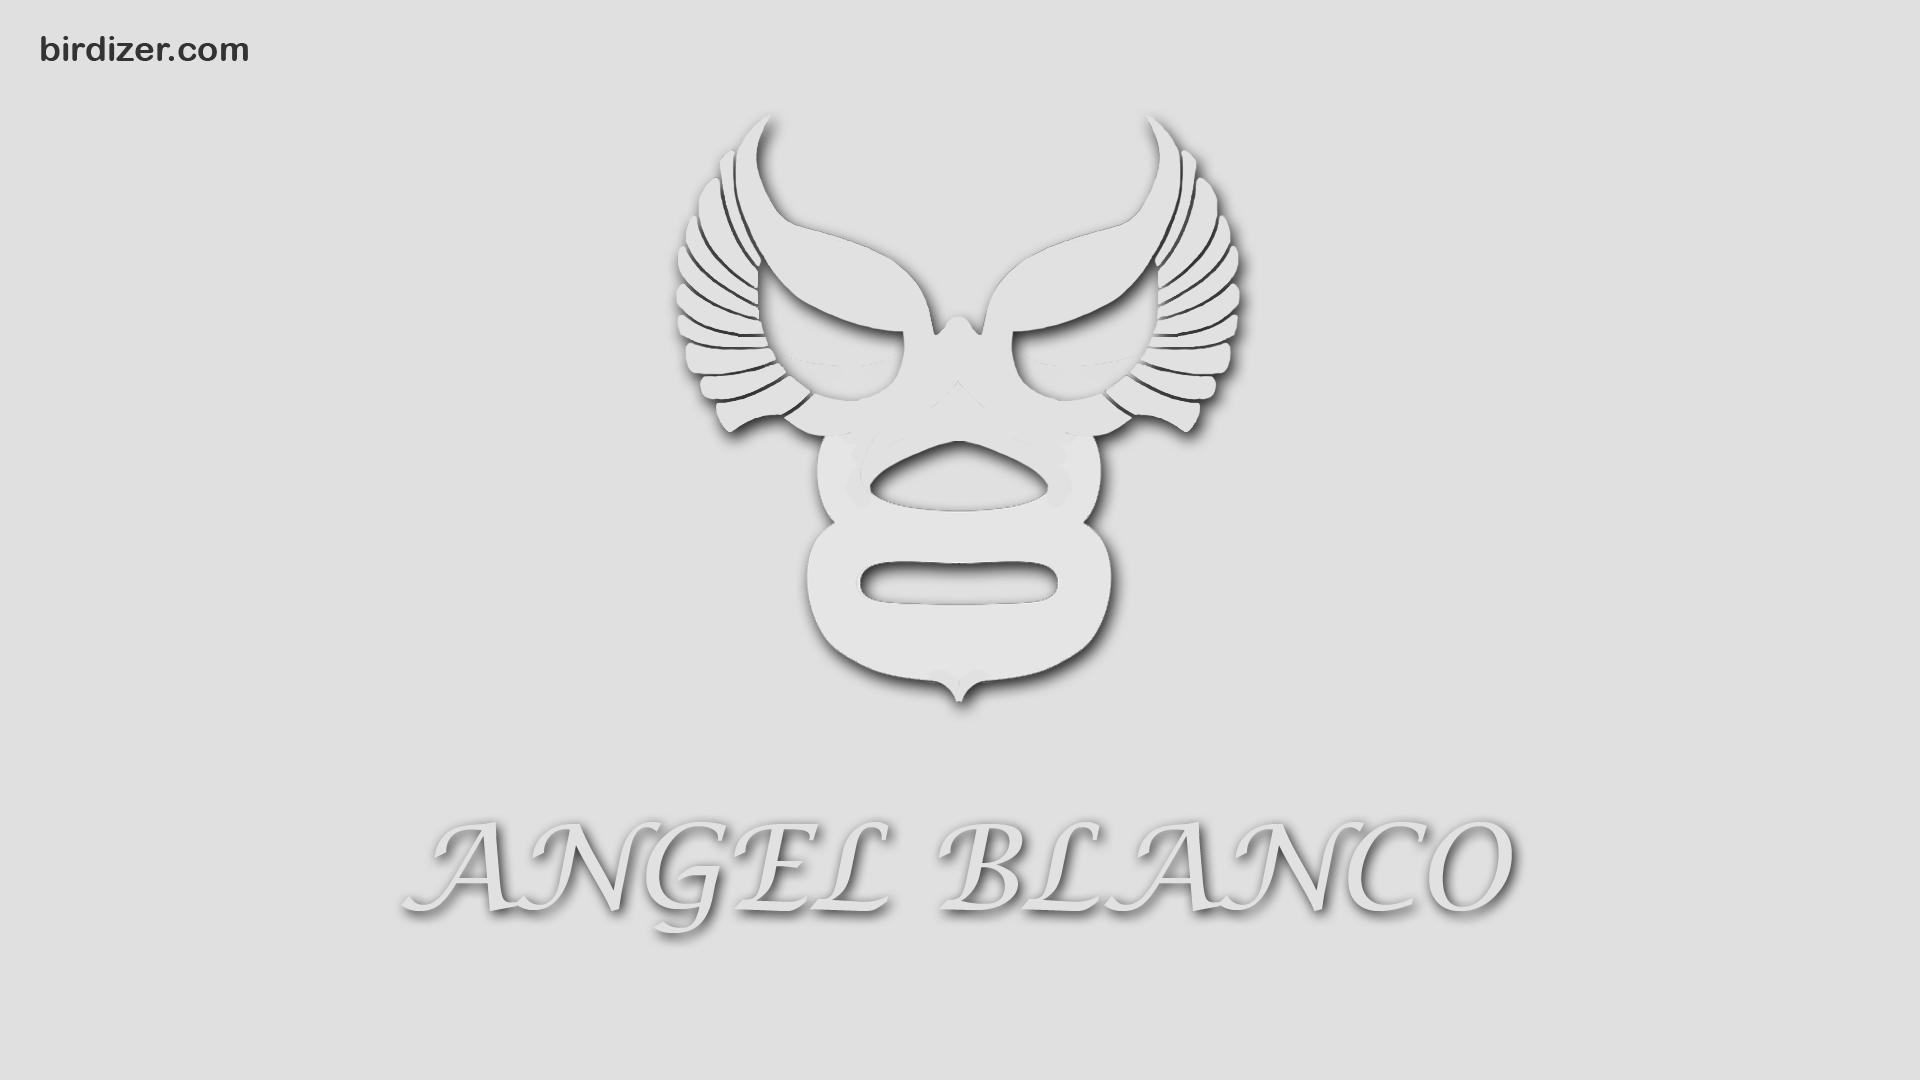 Angel Blanco Mascara Wallpaper